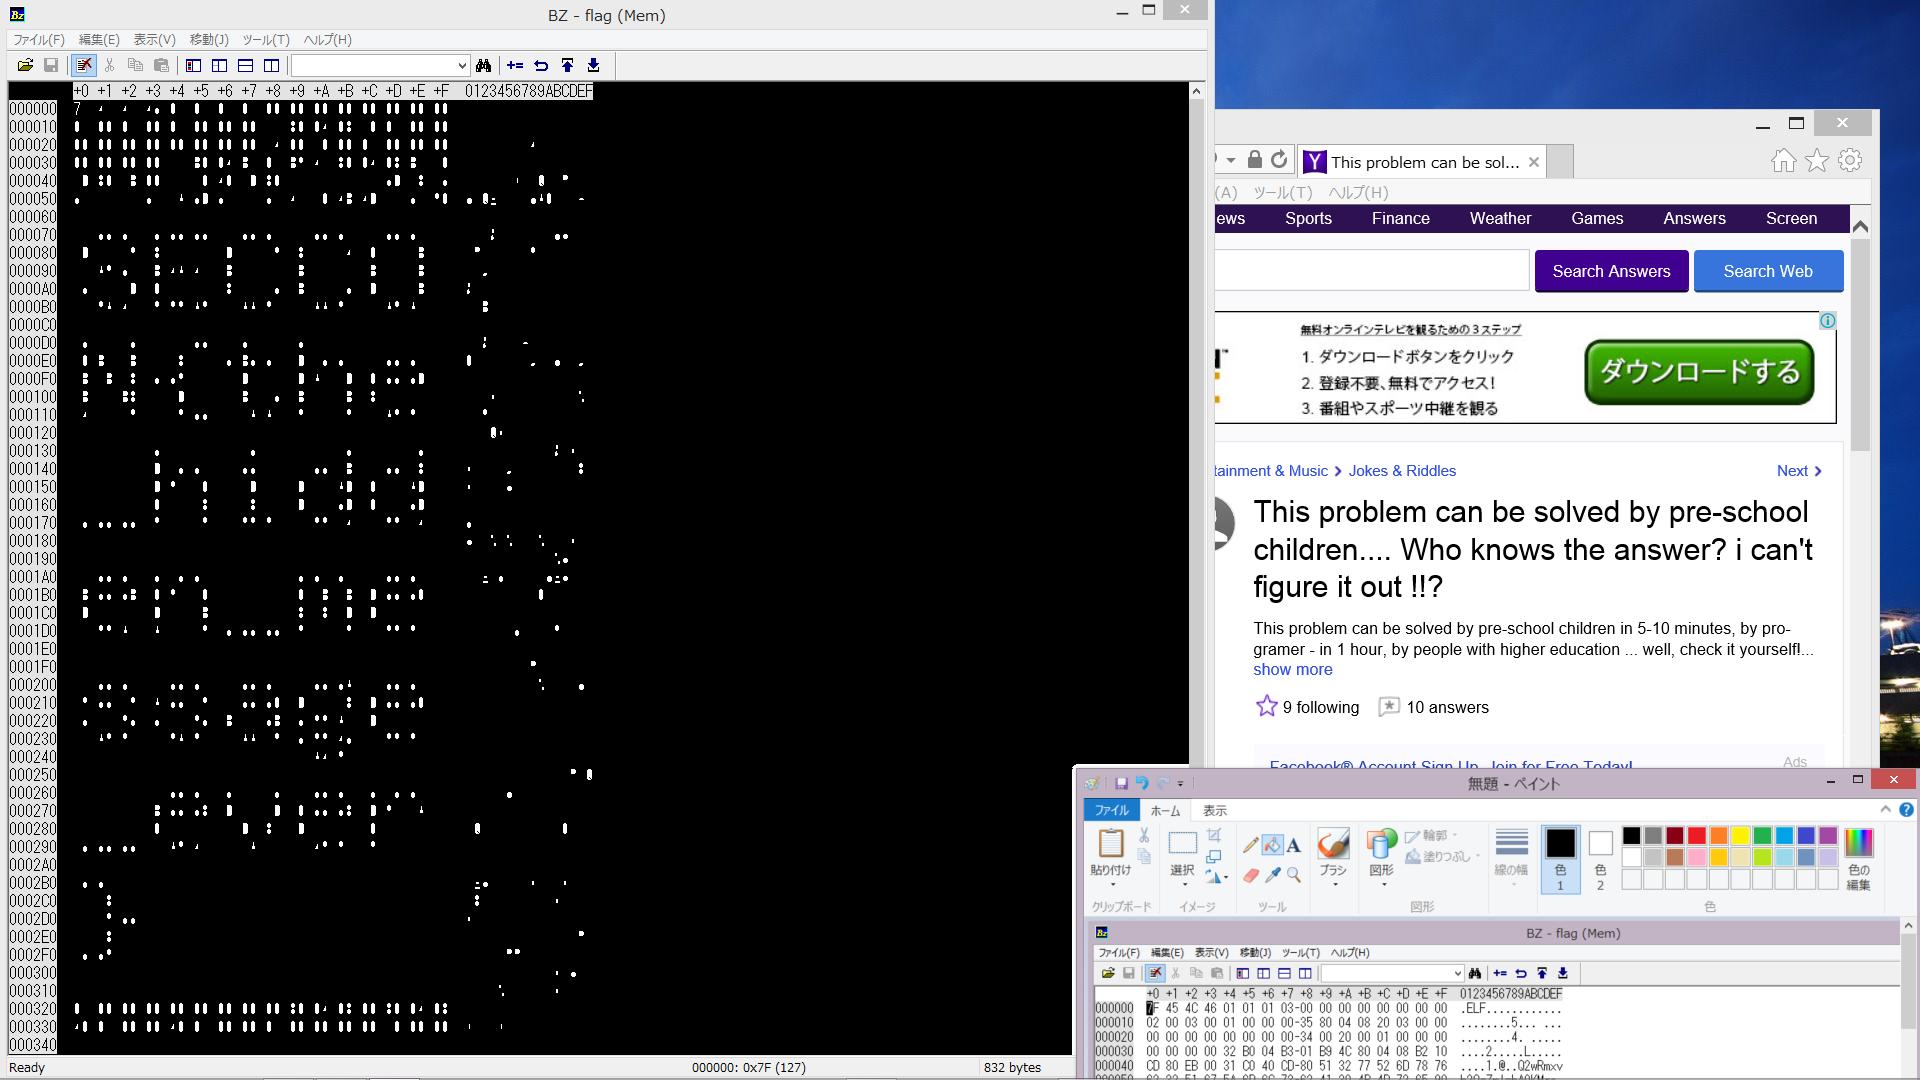 desktop_capture (2).png